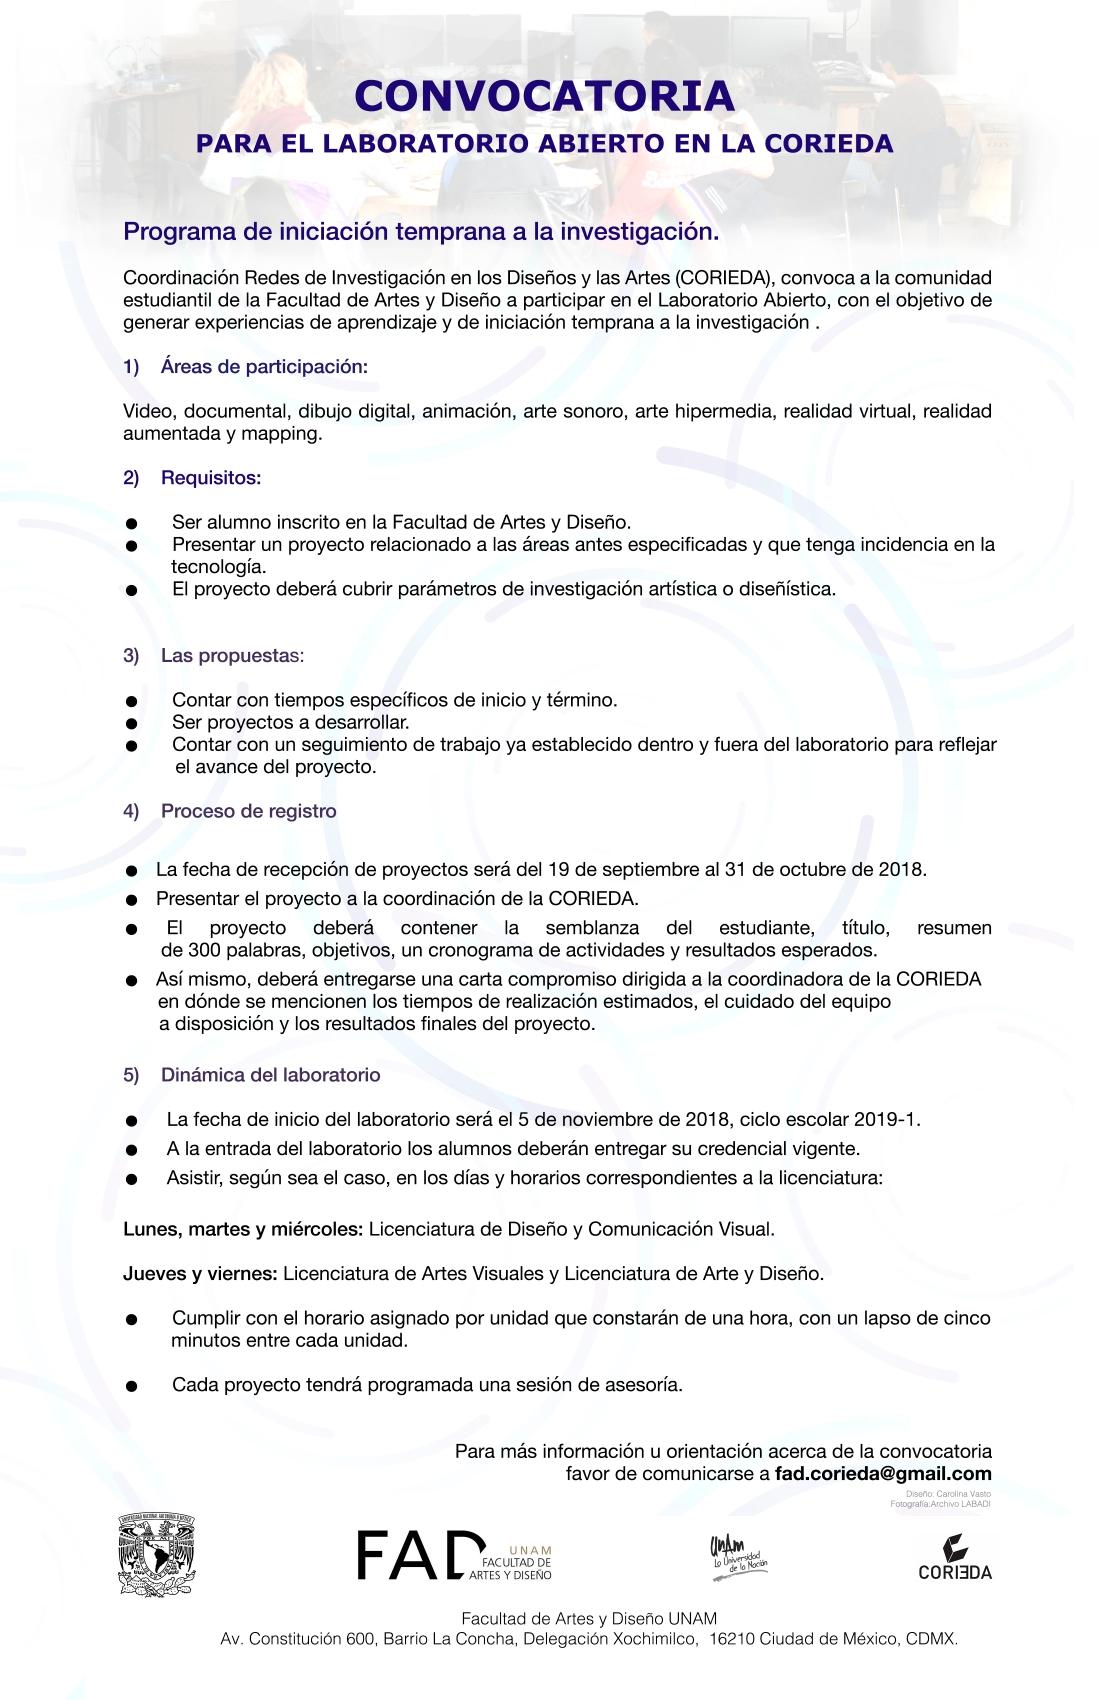 CONVOCATORIA_LaboratorioAbiertoV04.jpg